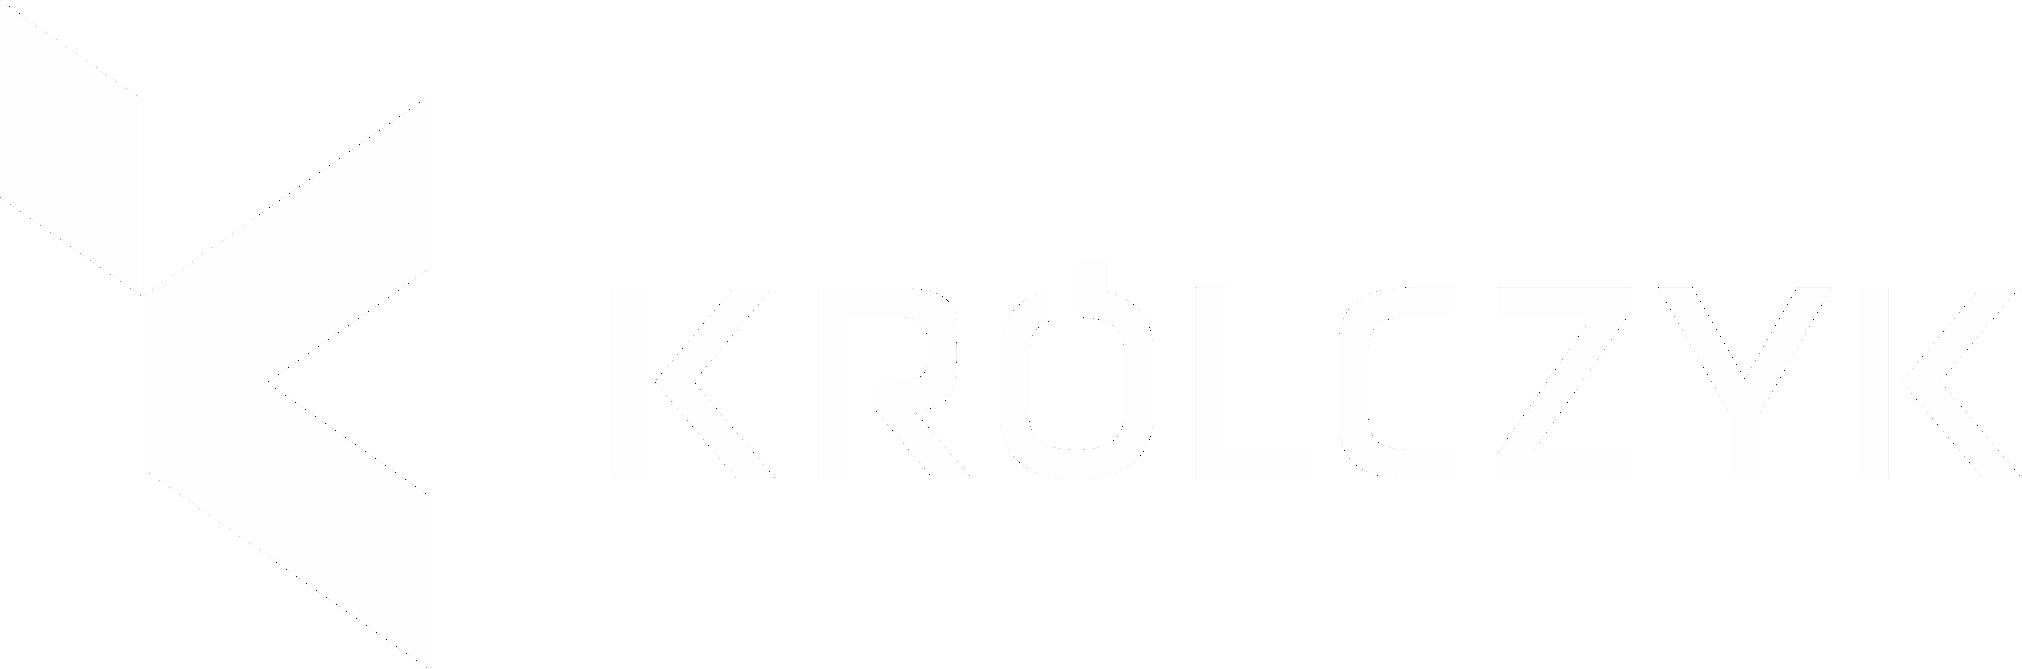 Krolczyk